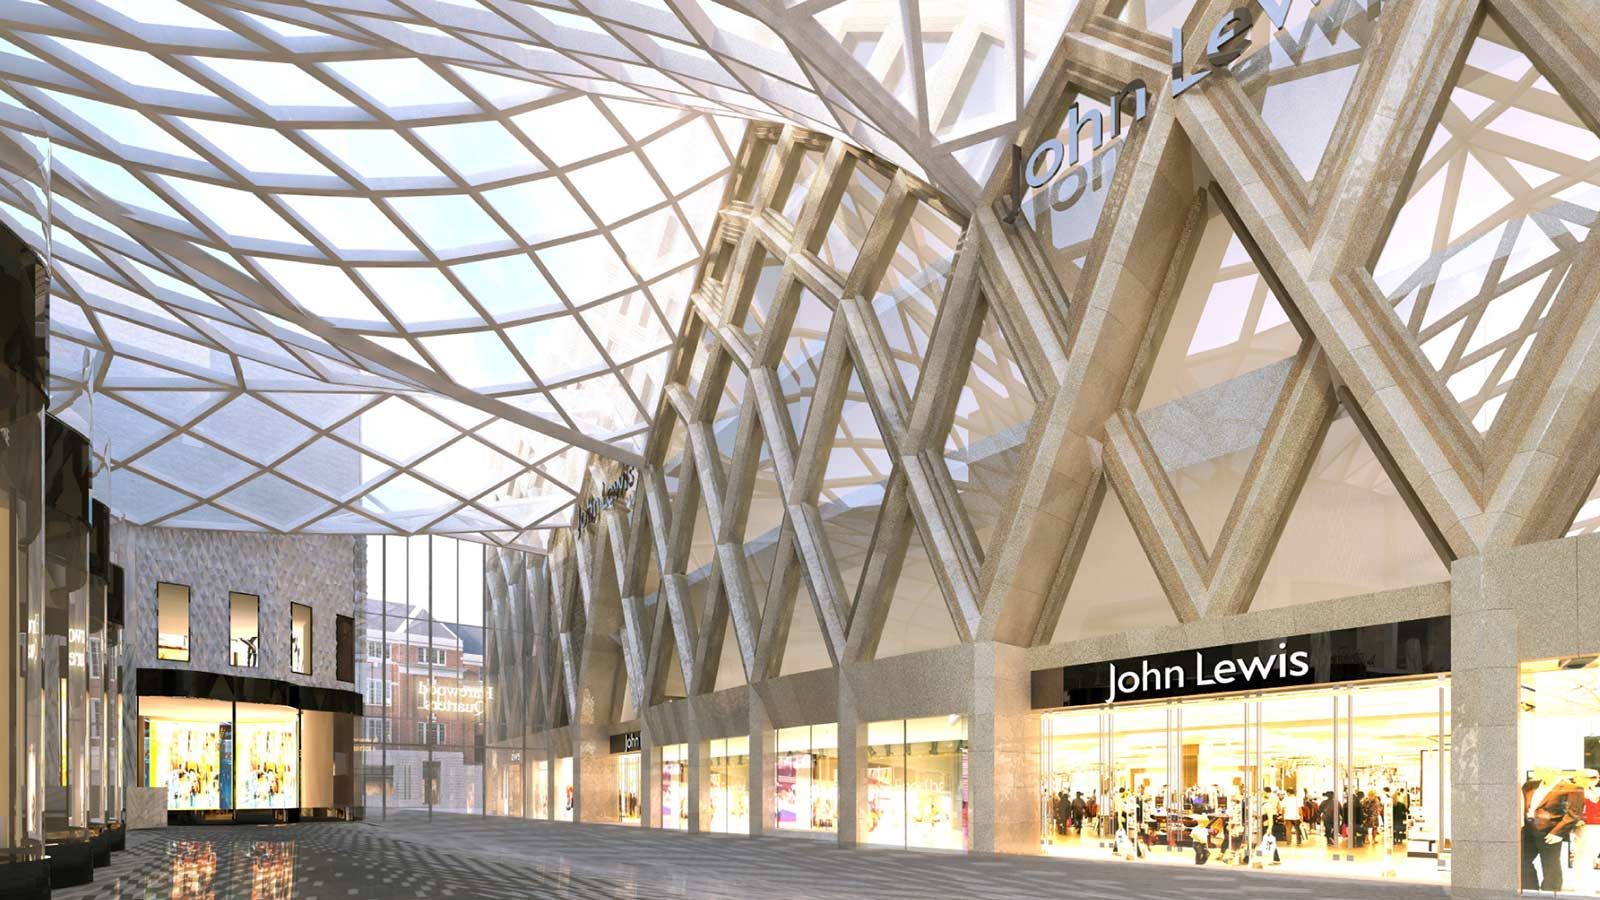 John Lewis Store Front - Mace Group